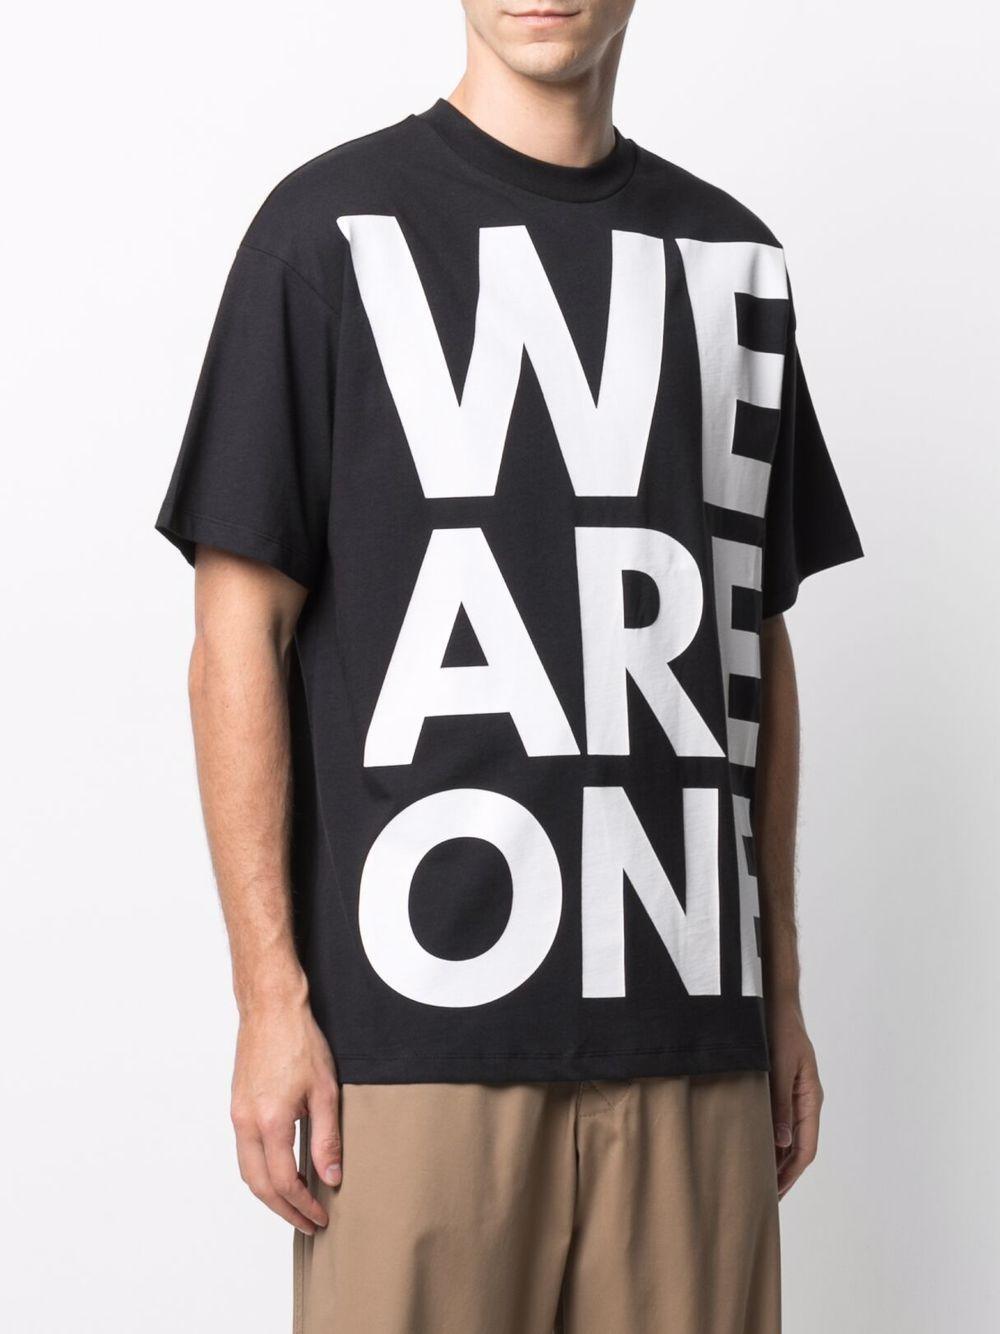 T-shirt con stampa uomo nero cotton HONEY FUCKING DIJON | T-shirt | HFD03T008BLACK